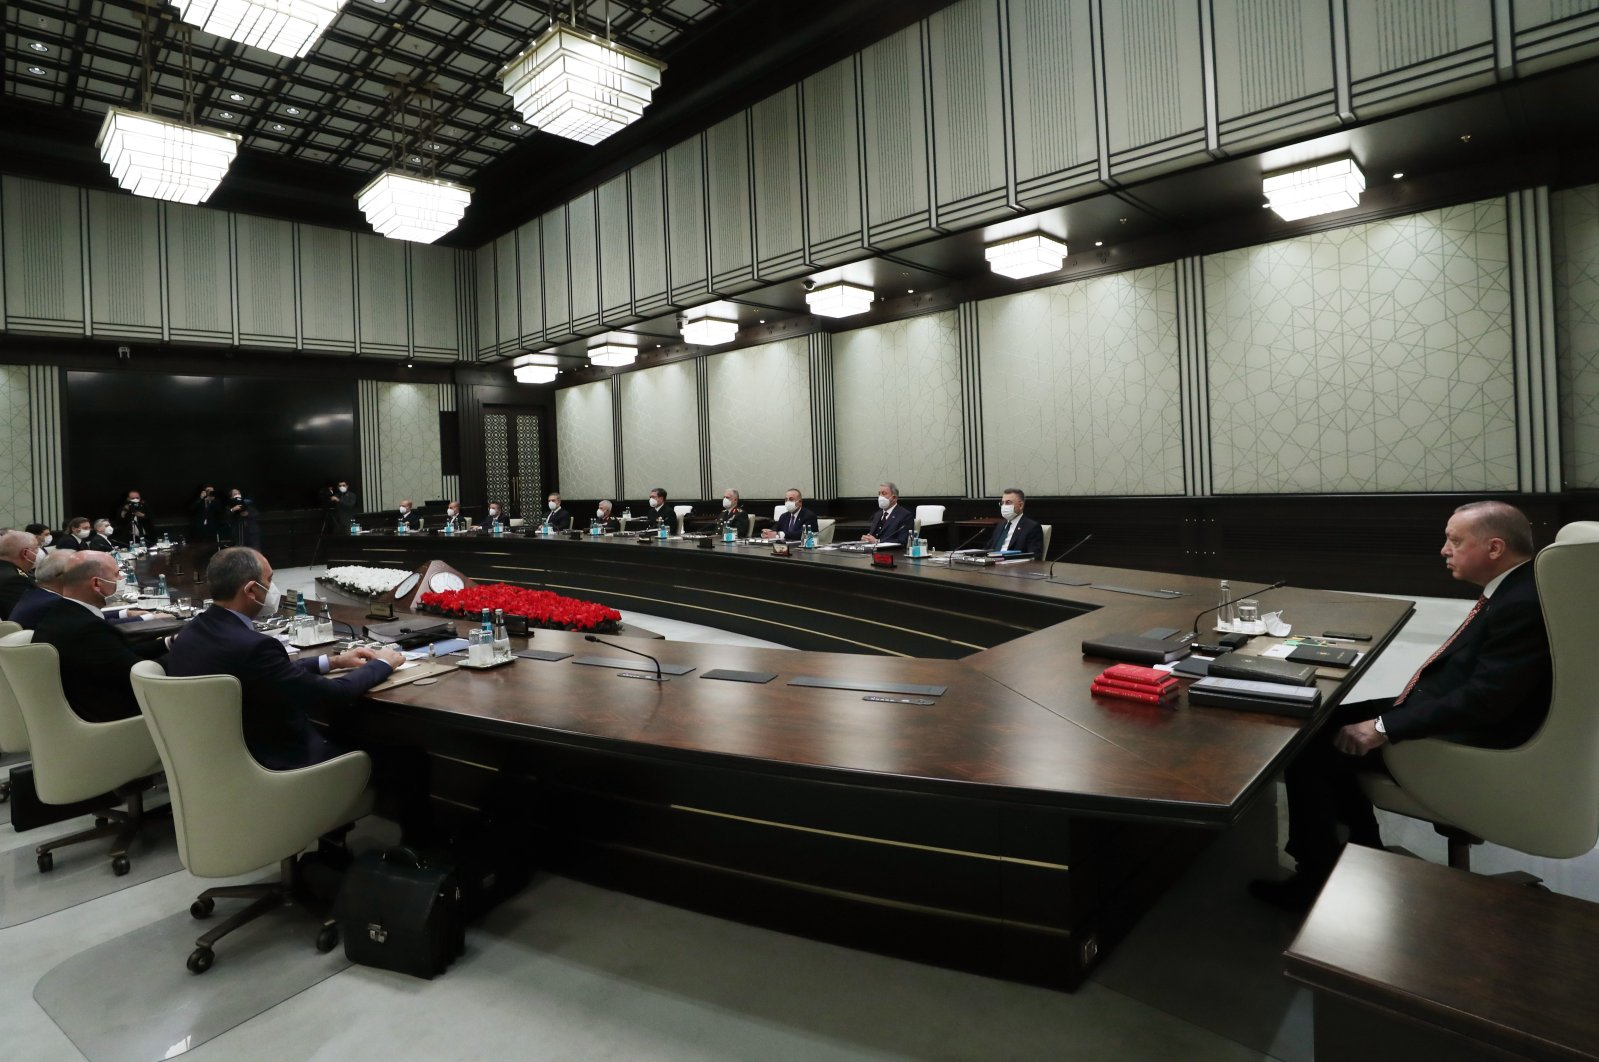 Turkey's National Security Council (MGK) meets under the chair of President Recep Tayyip Erdoğan (R) in the capital Ankara, Turkey, March 30, 2021. (AA Photo)